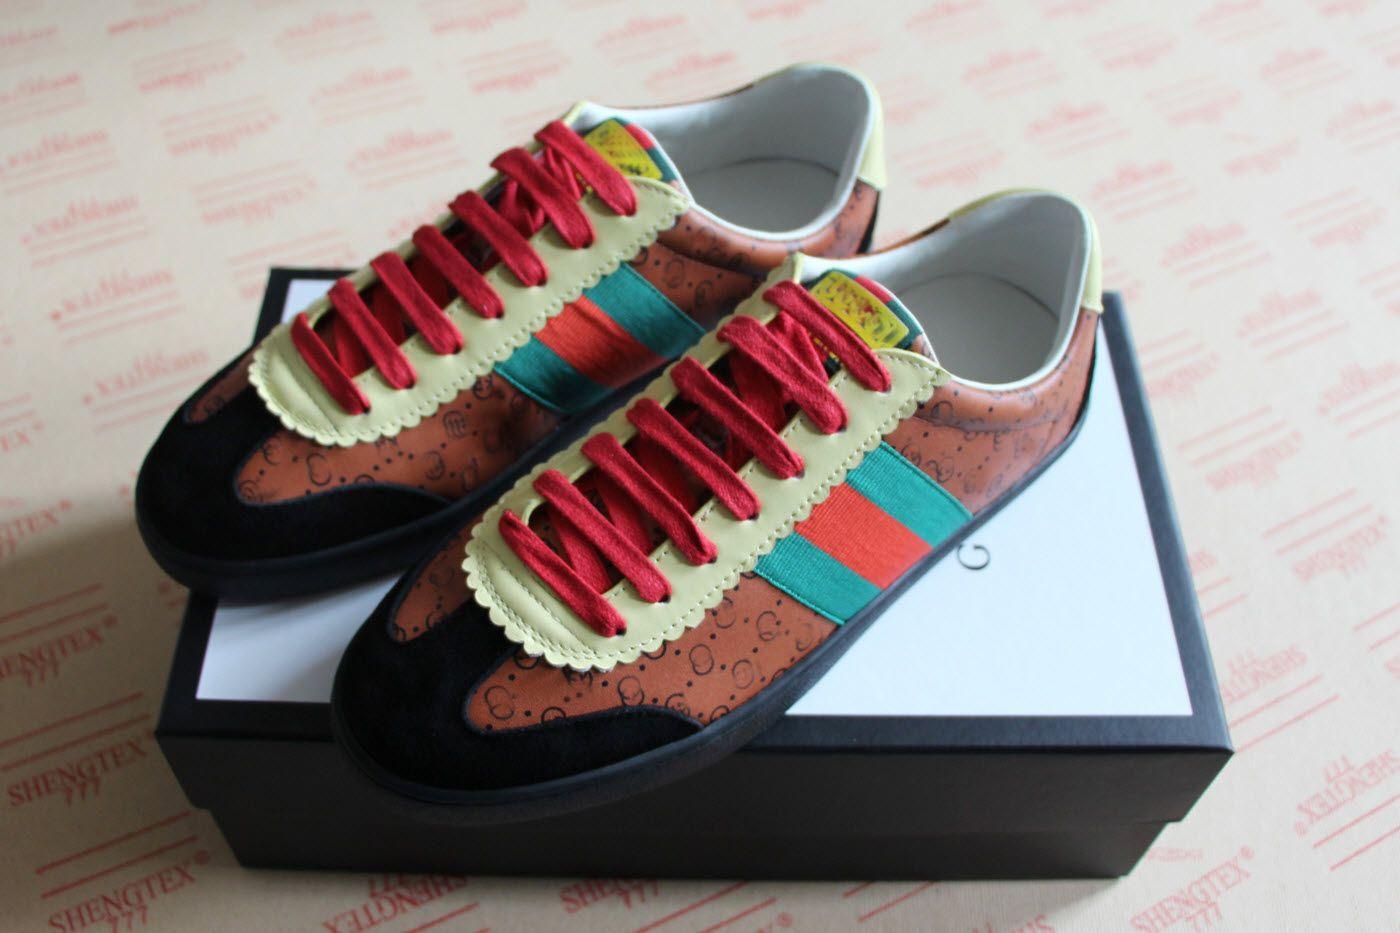 b27622f069a Mens Women Designer Shoe Fashion Dapper Luxury Brand Dan Casual Shoes Black  Light Brown White Python Leather Sneakers Designer Shoes Sneakers Mens  Designer ...